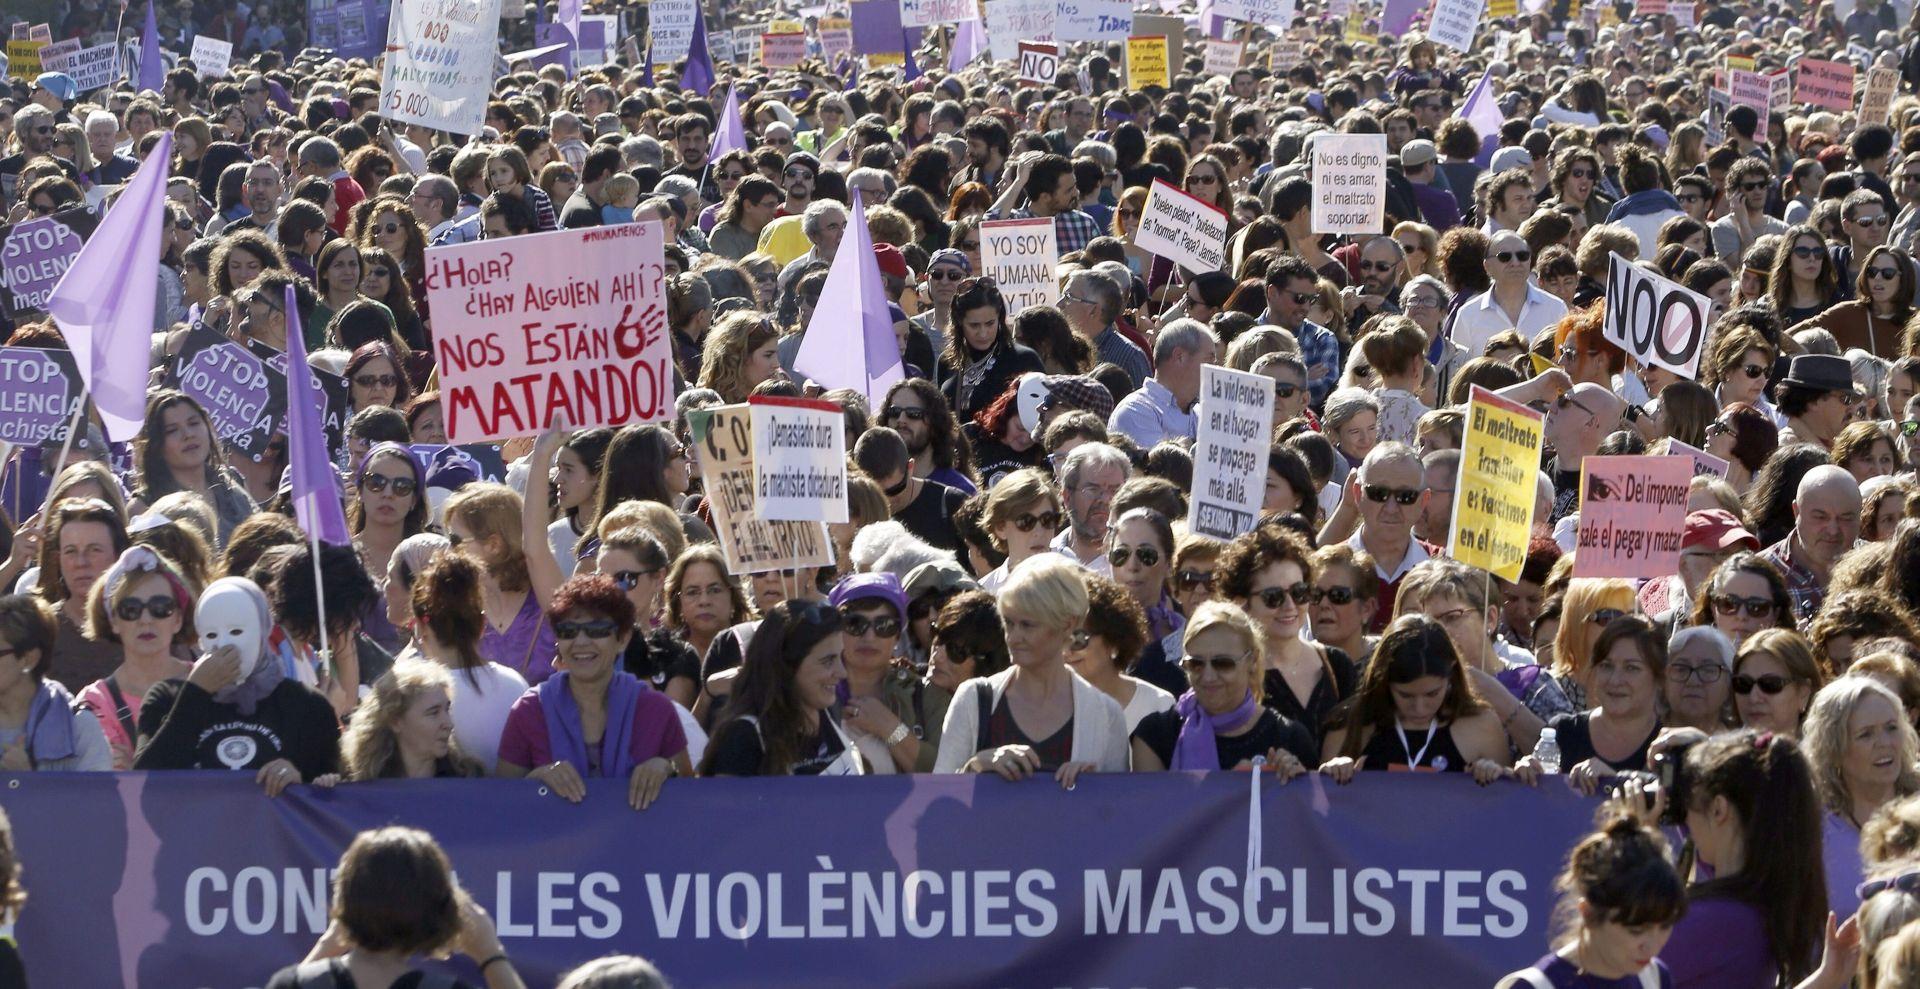 Španjolci veliki prosvjedom osudili nasilje protiv žena